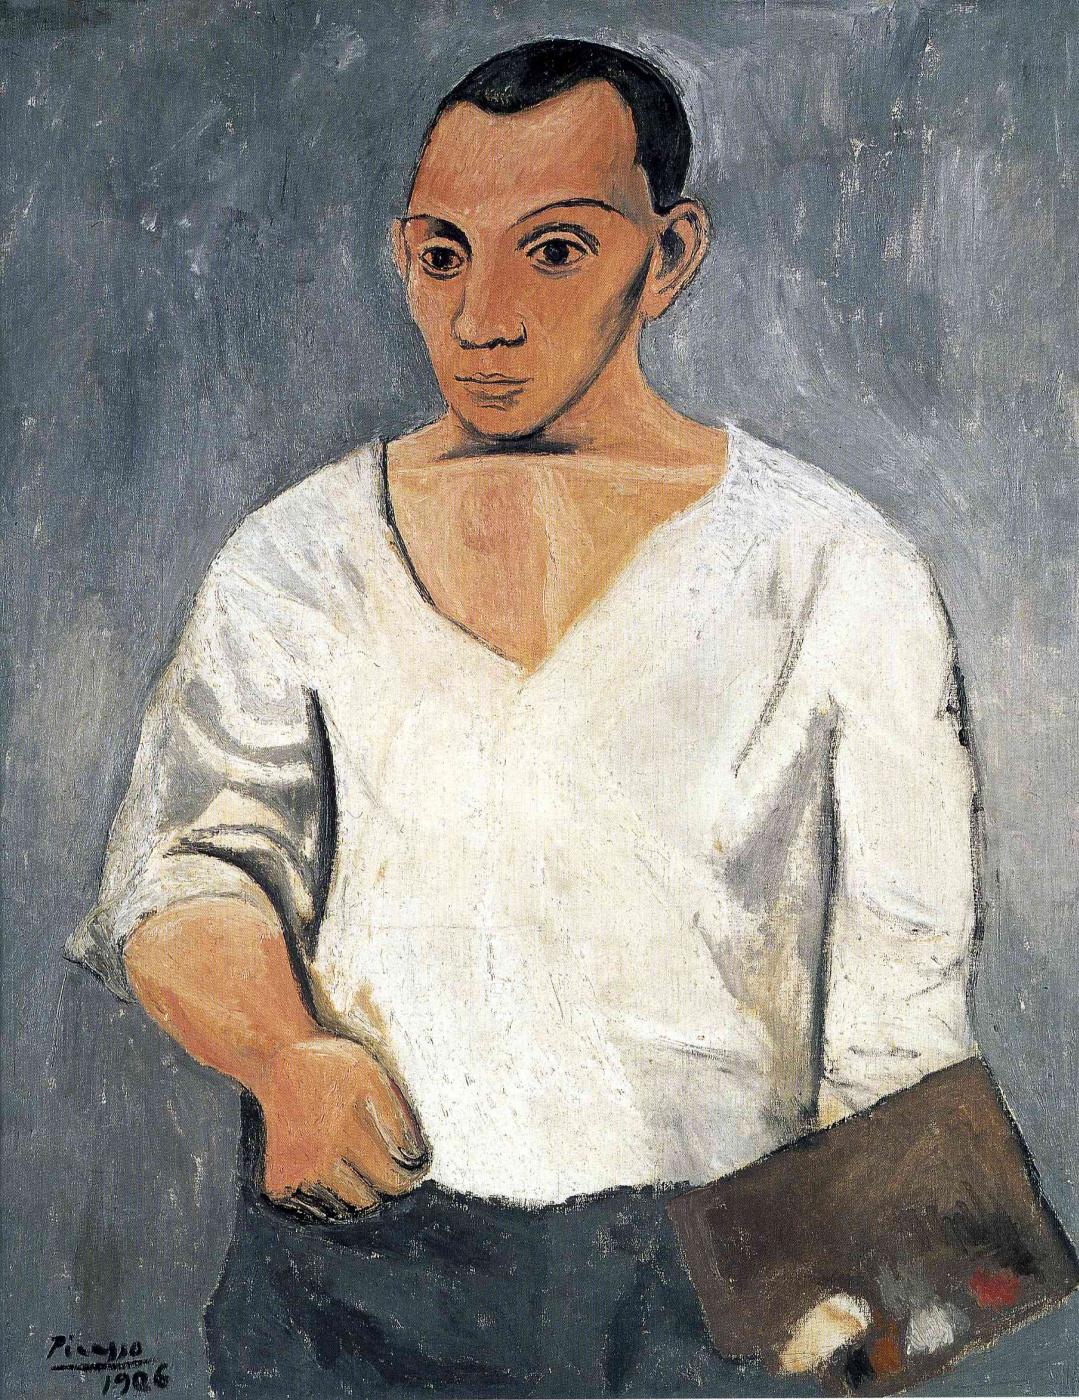 Pablo Picasso. Self-portrait with palette